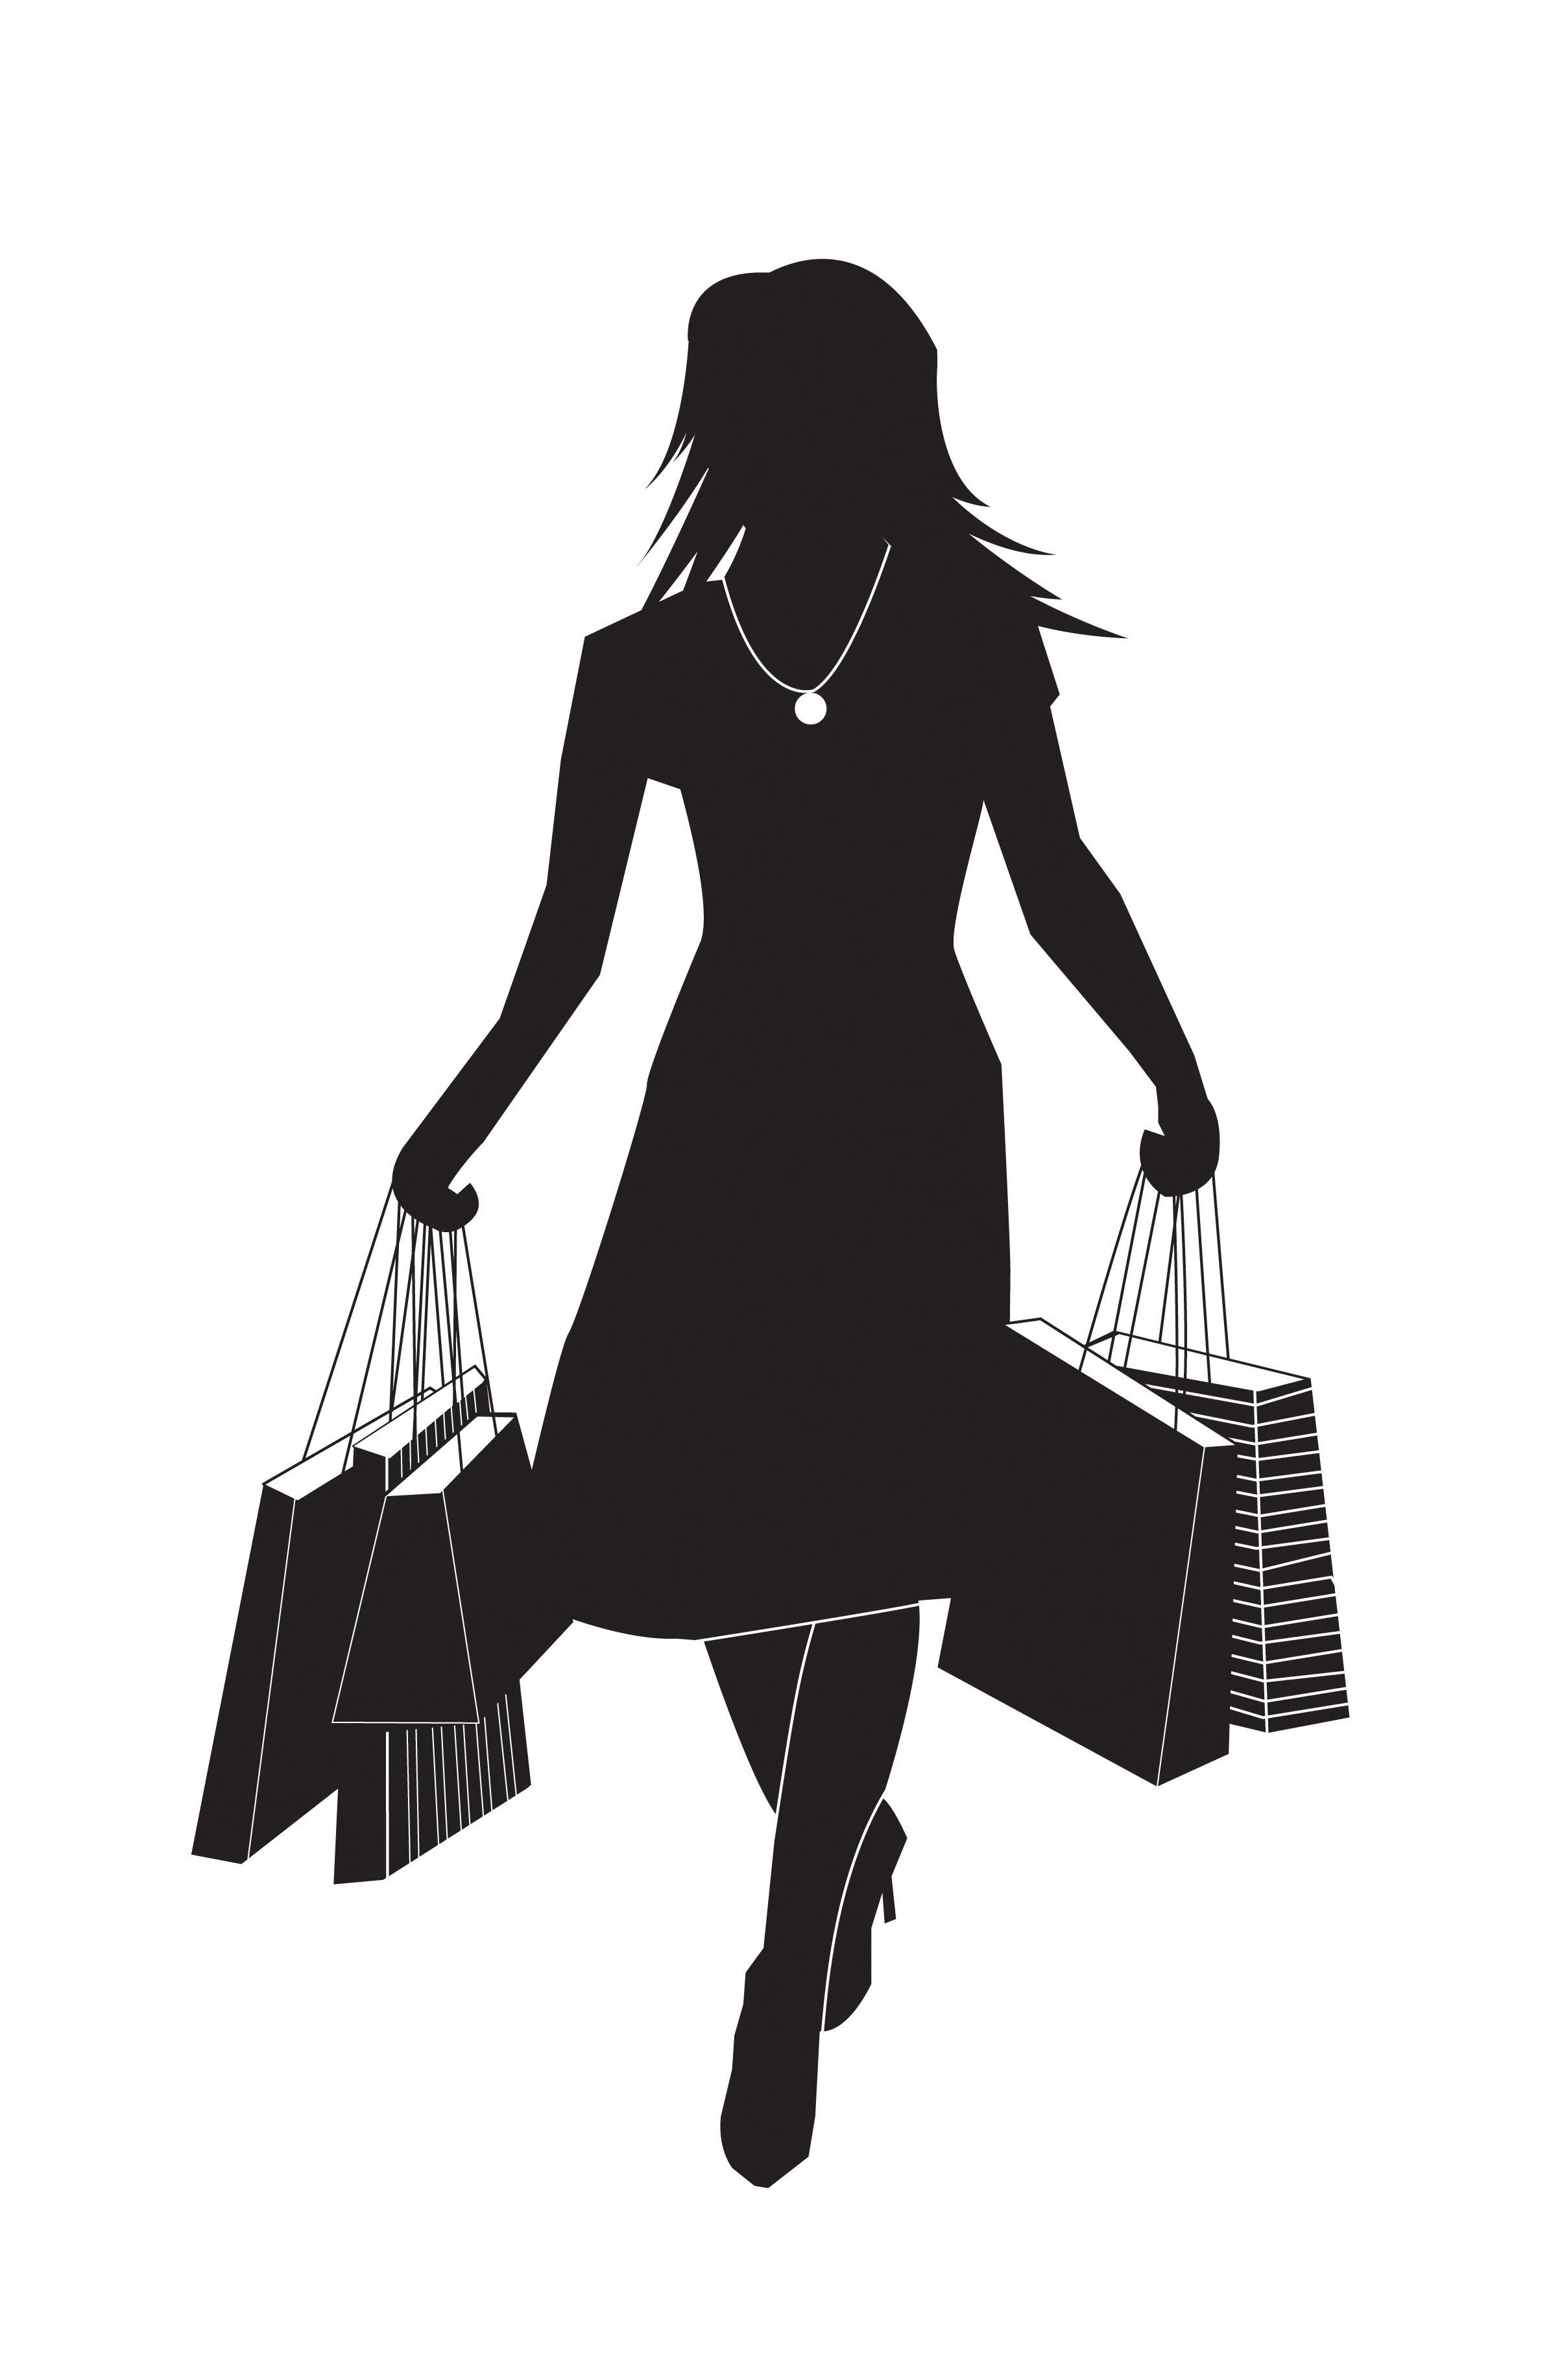 Illustration shoppingtjej